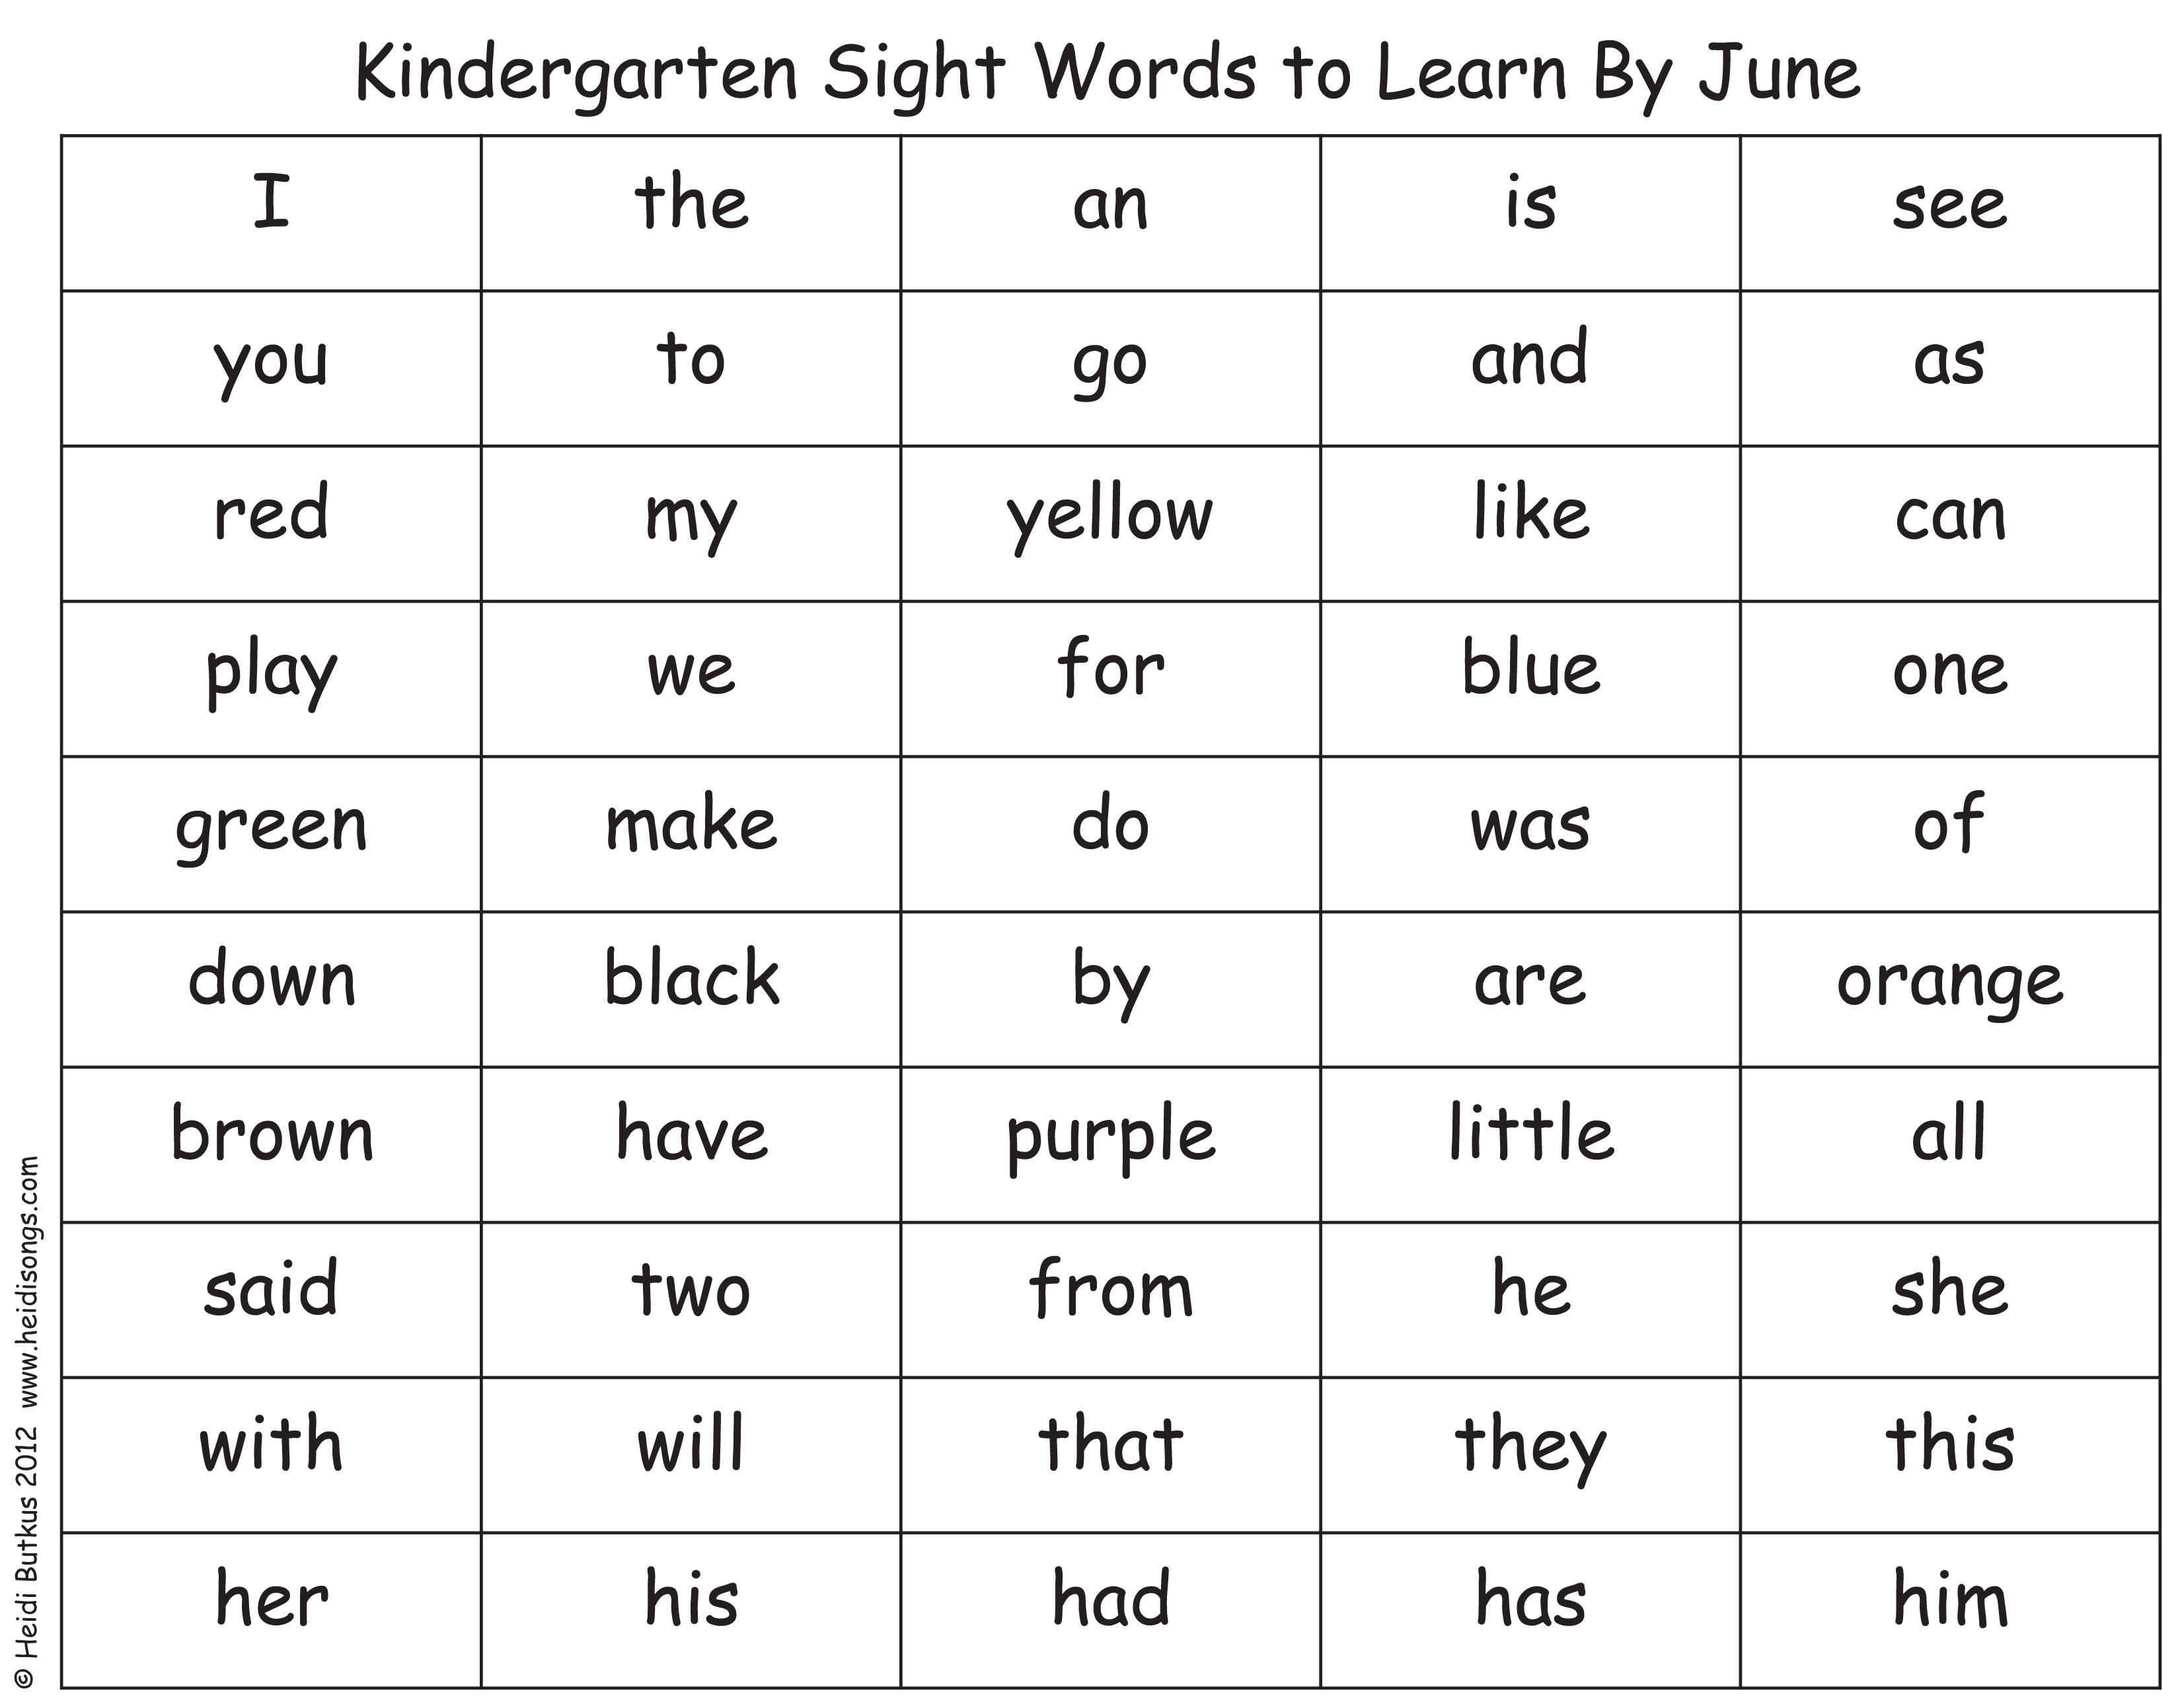 Kindergarten Sight Words List Great Minus The Colors